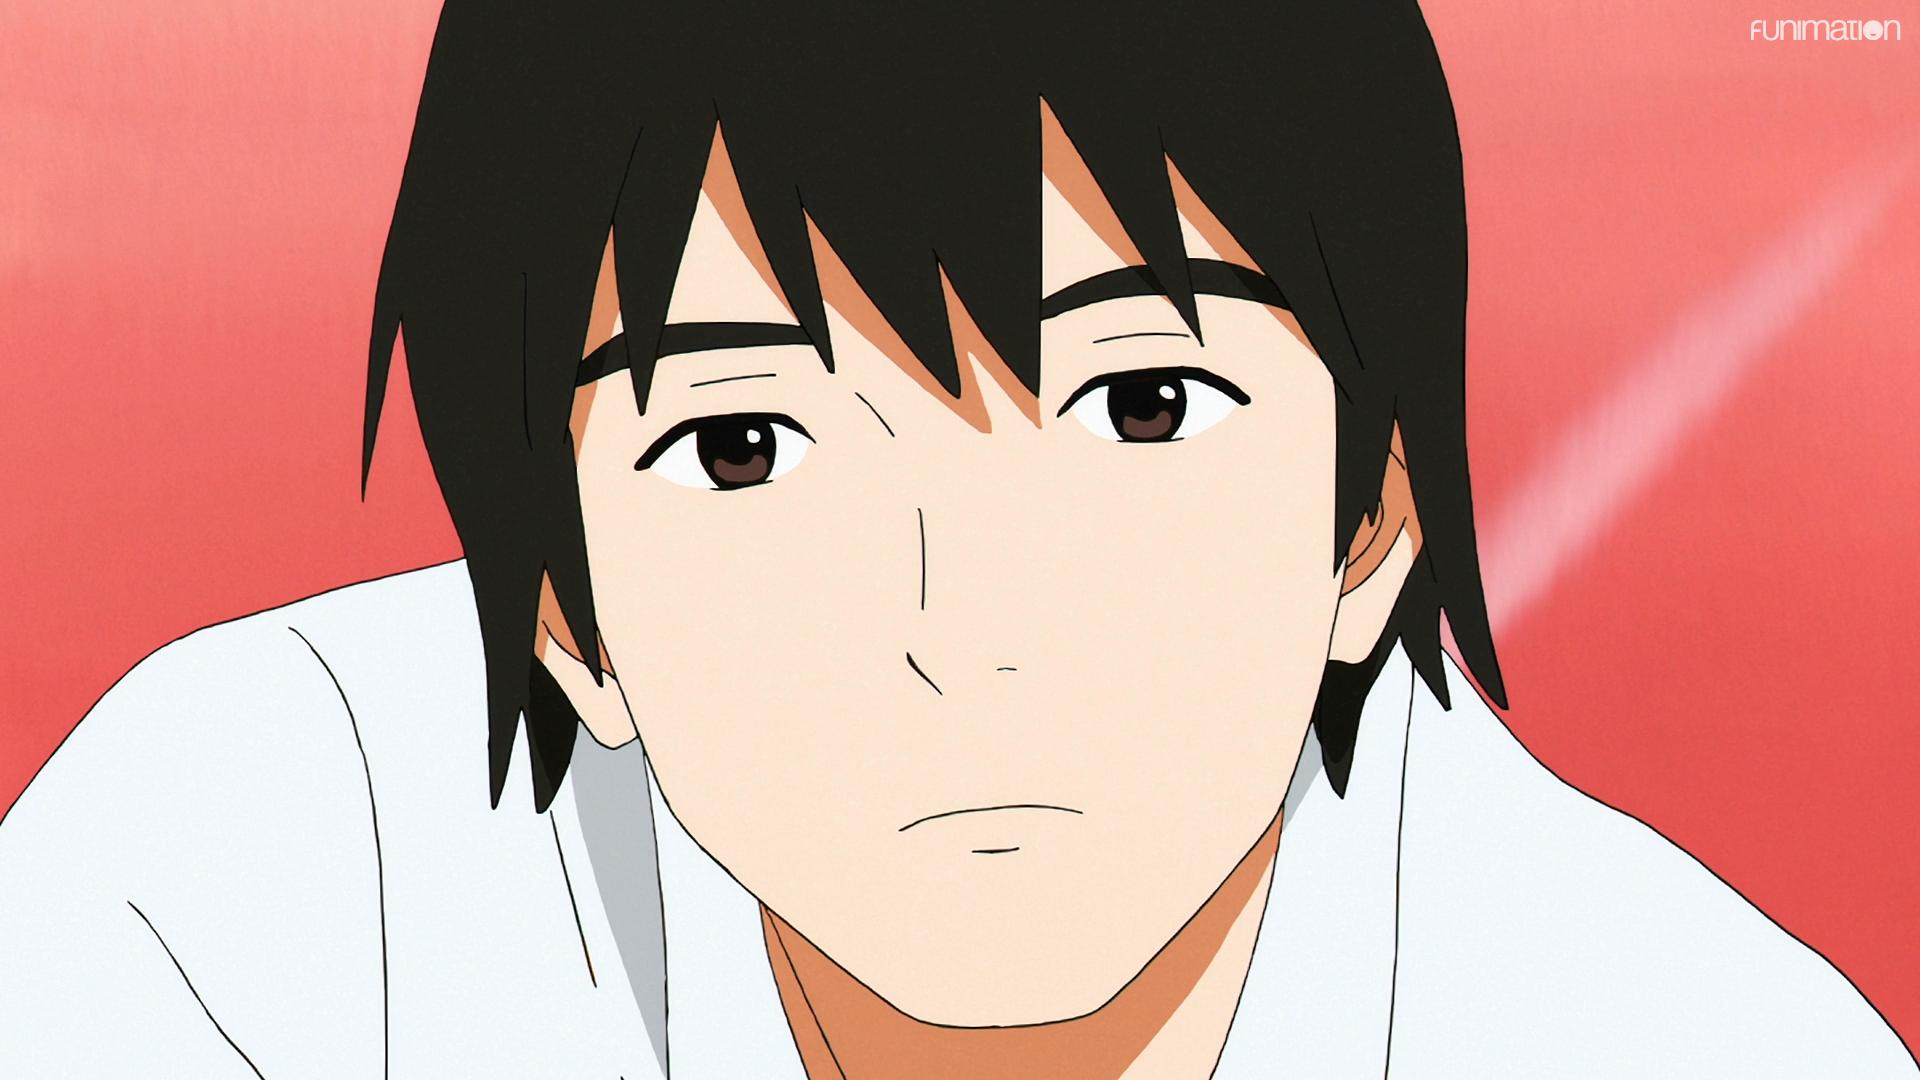 Sonny Boy / Episode 1 / Nagara staring up at the sky